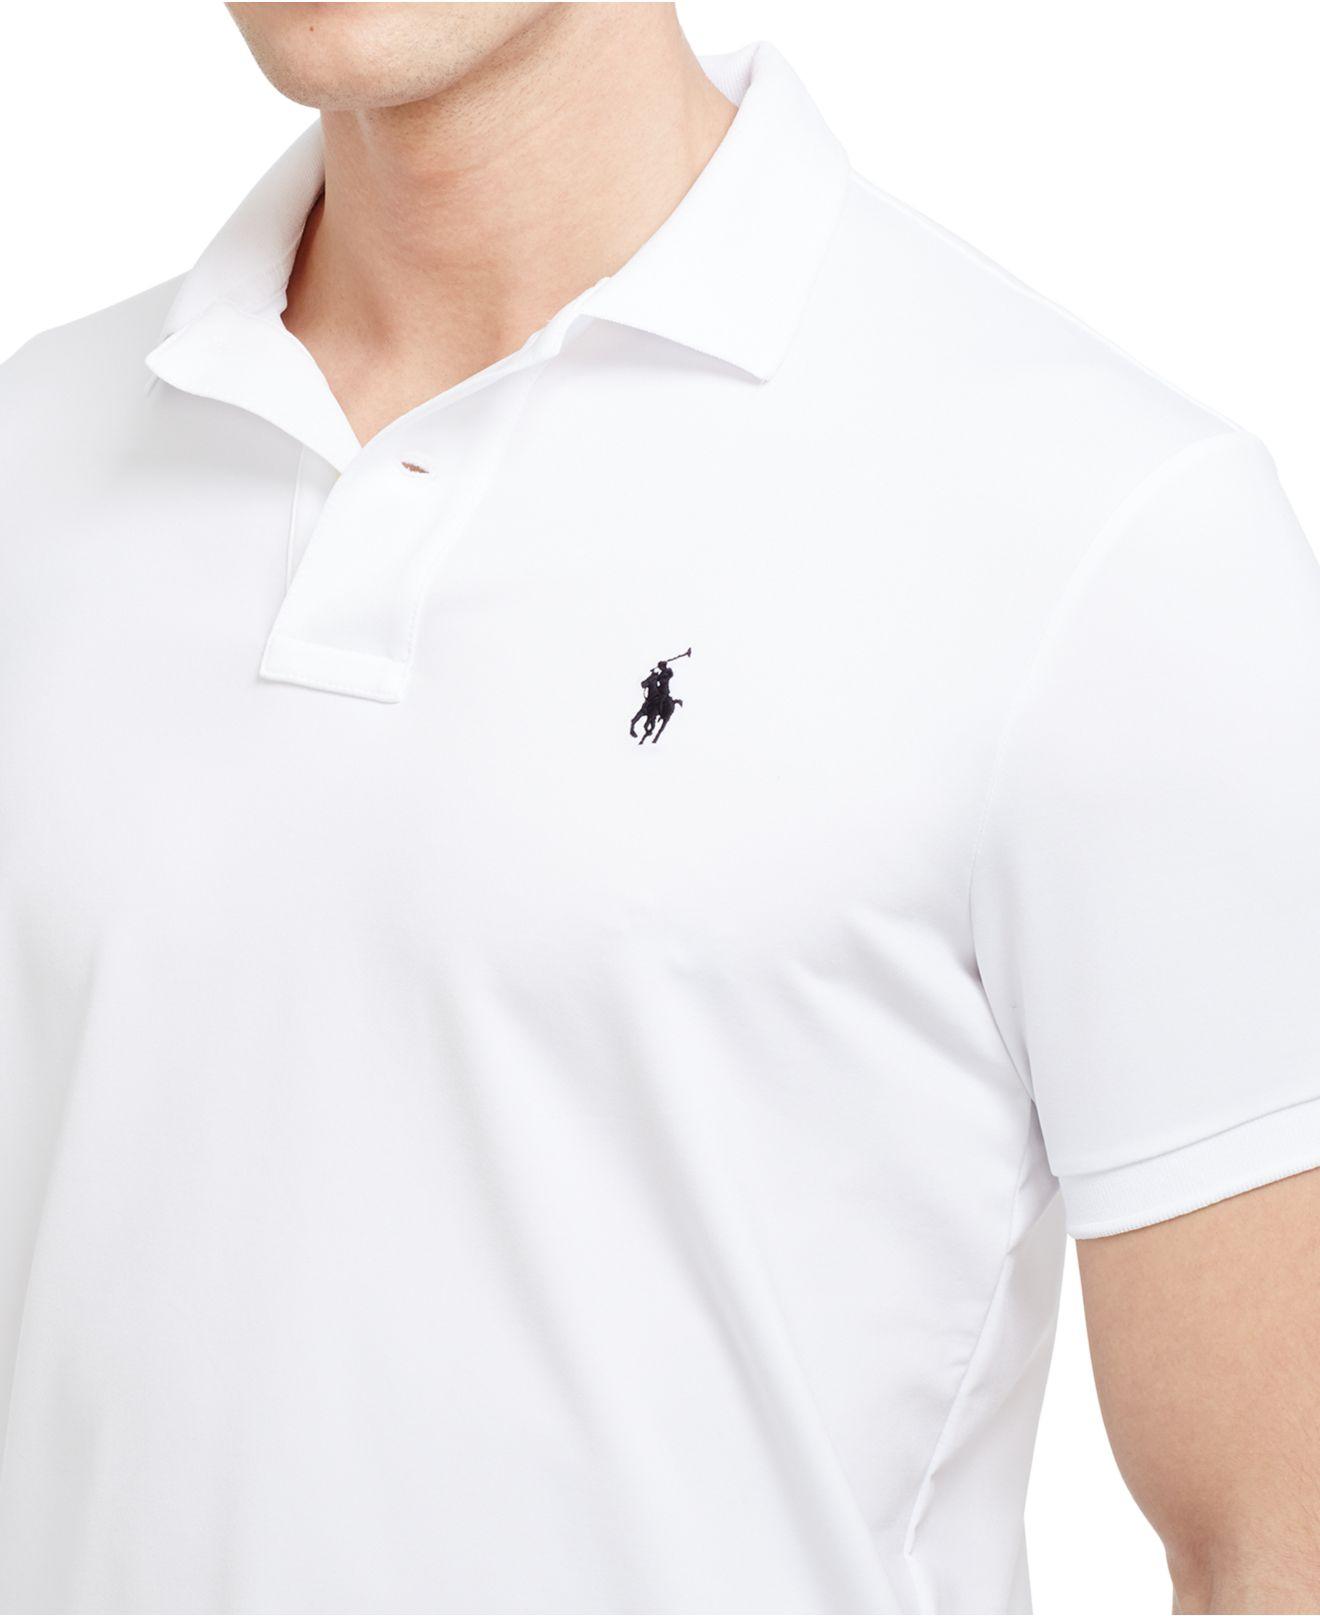 Lyst Polo Ralph Lauren Performance Polo Shirt In White For Men